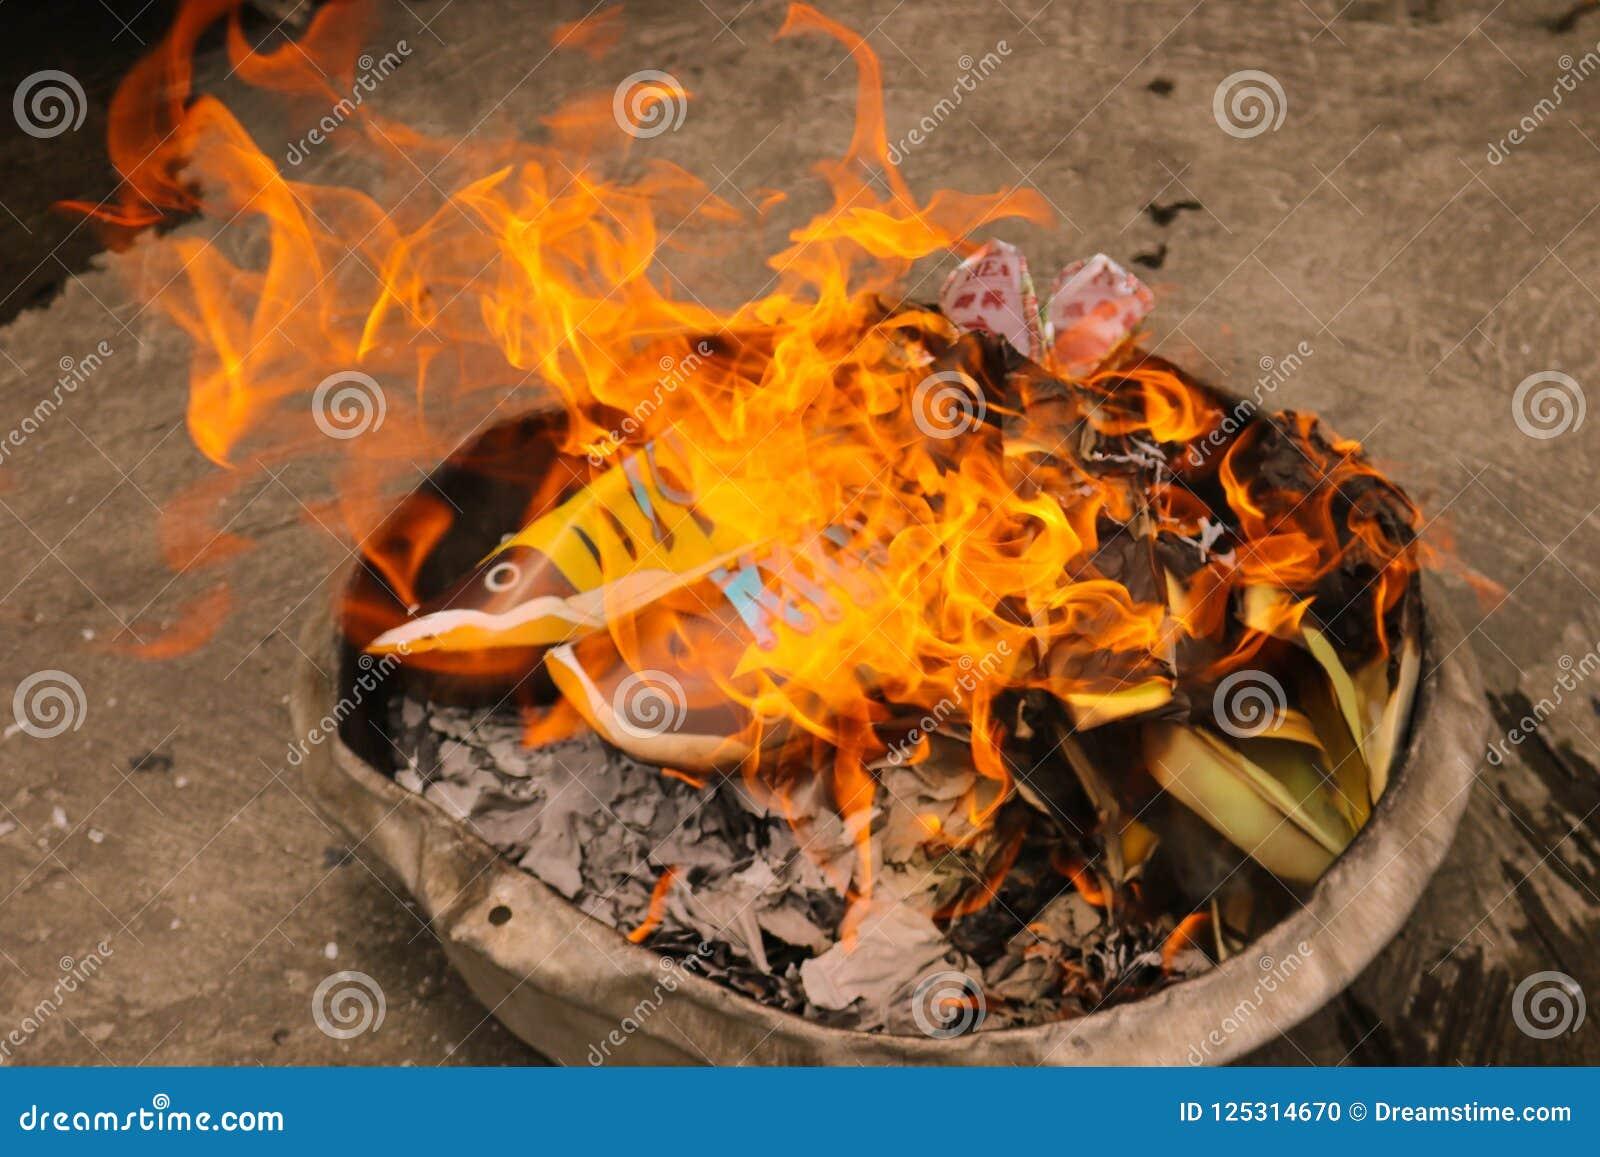 Joss document brandwond in brand in Chinees Spookfestival